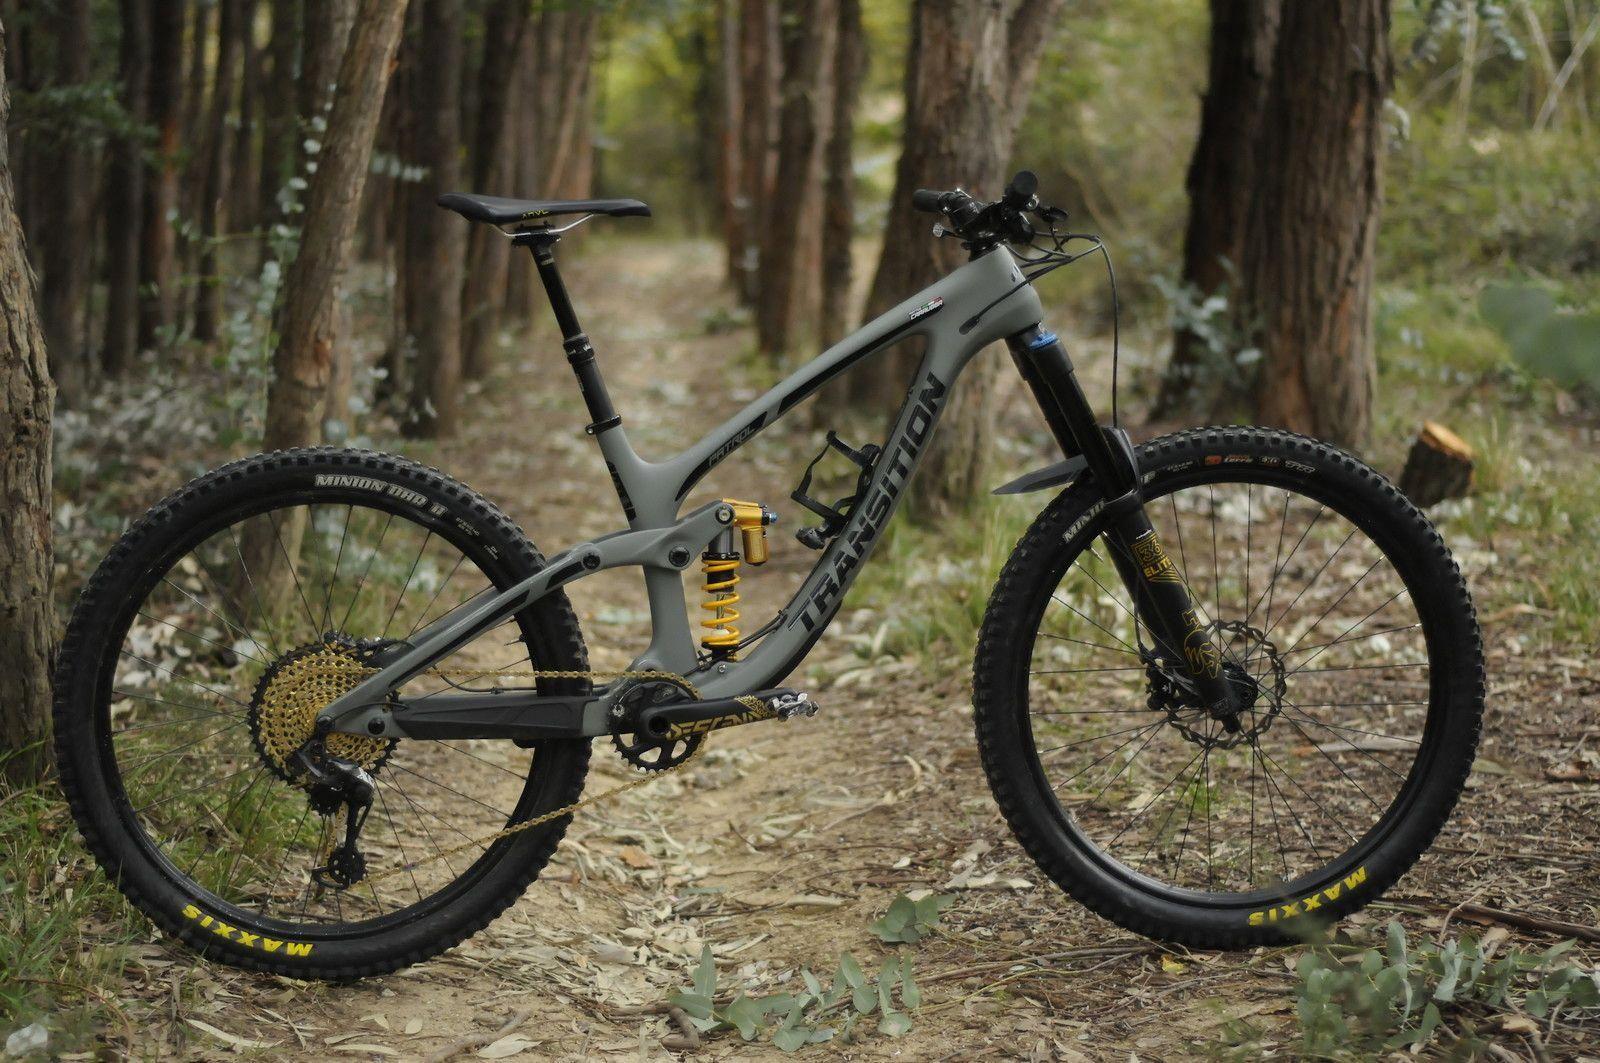 9672044898a Transition Patrol Carbon 2019 - bubbaz's Bike Check - Vital MTB #roadbike